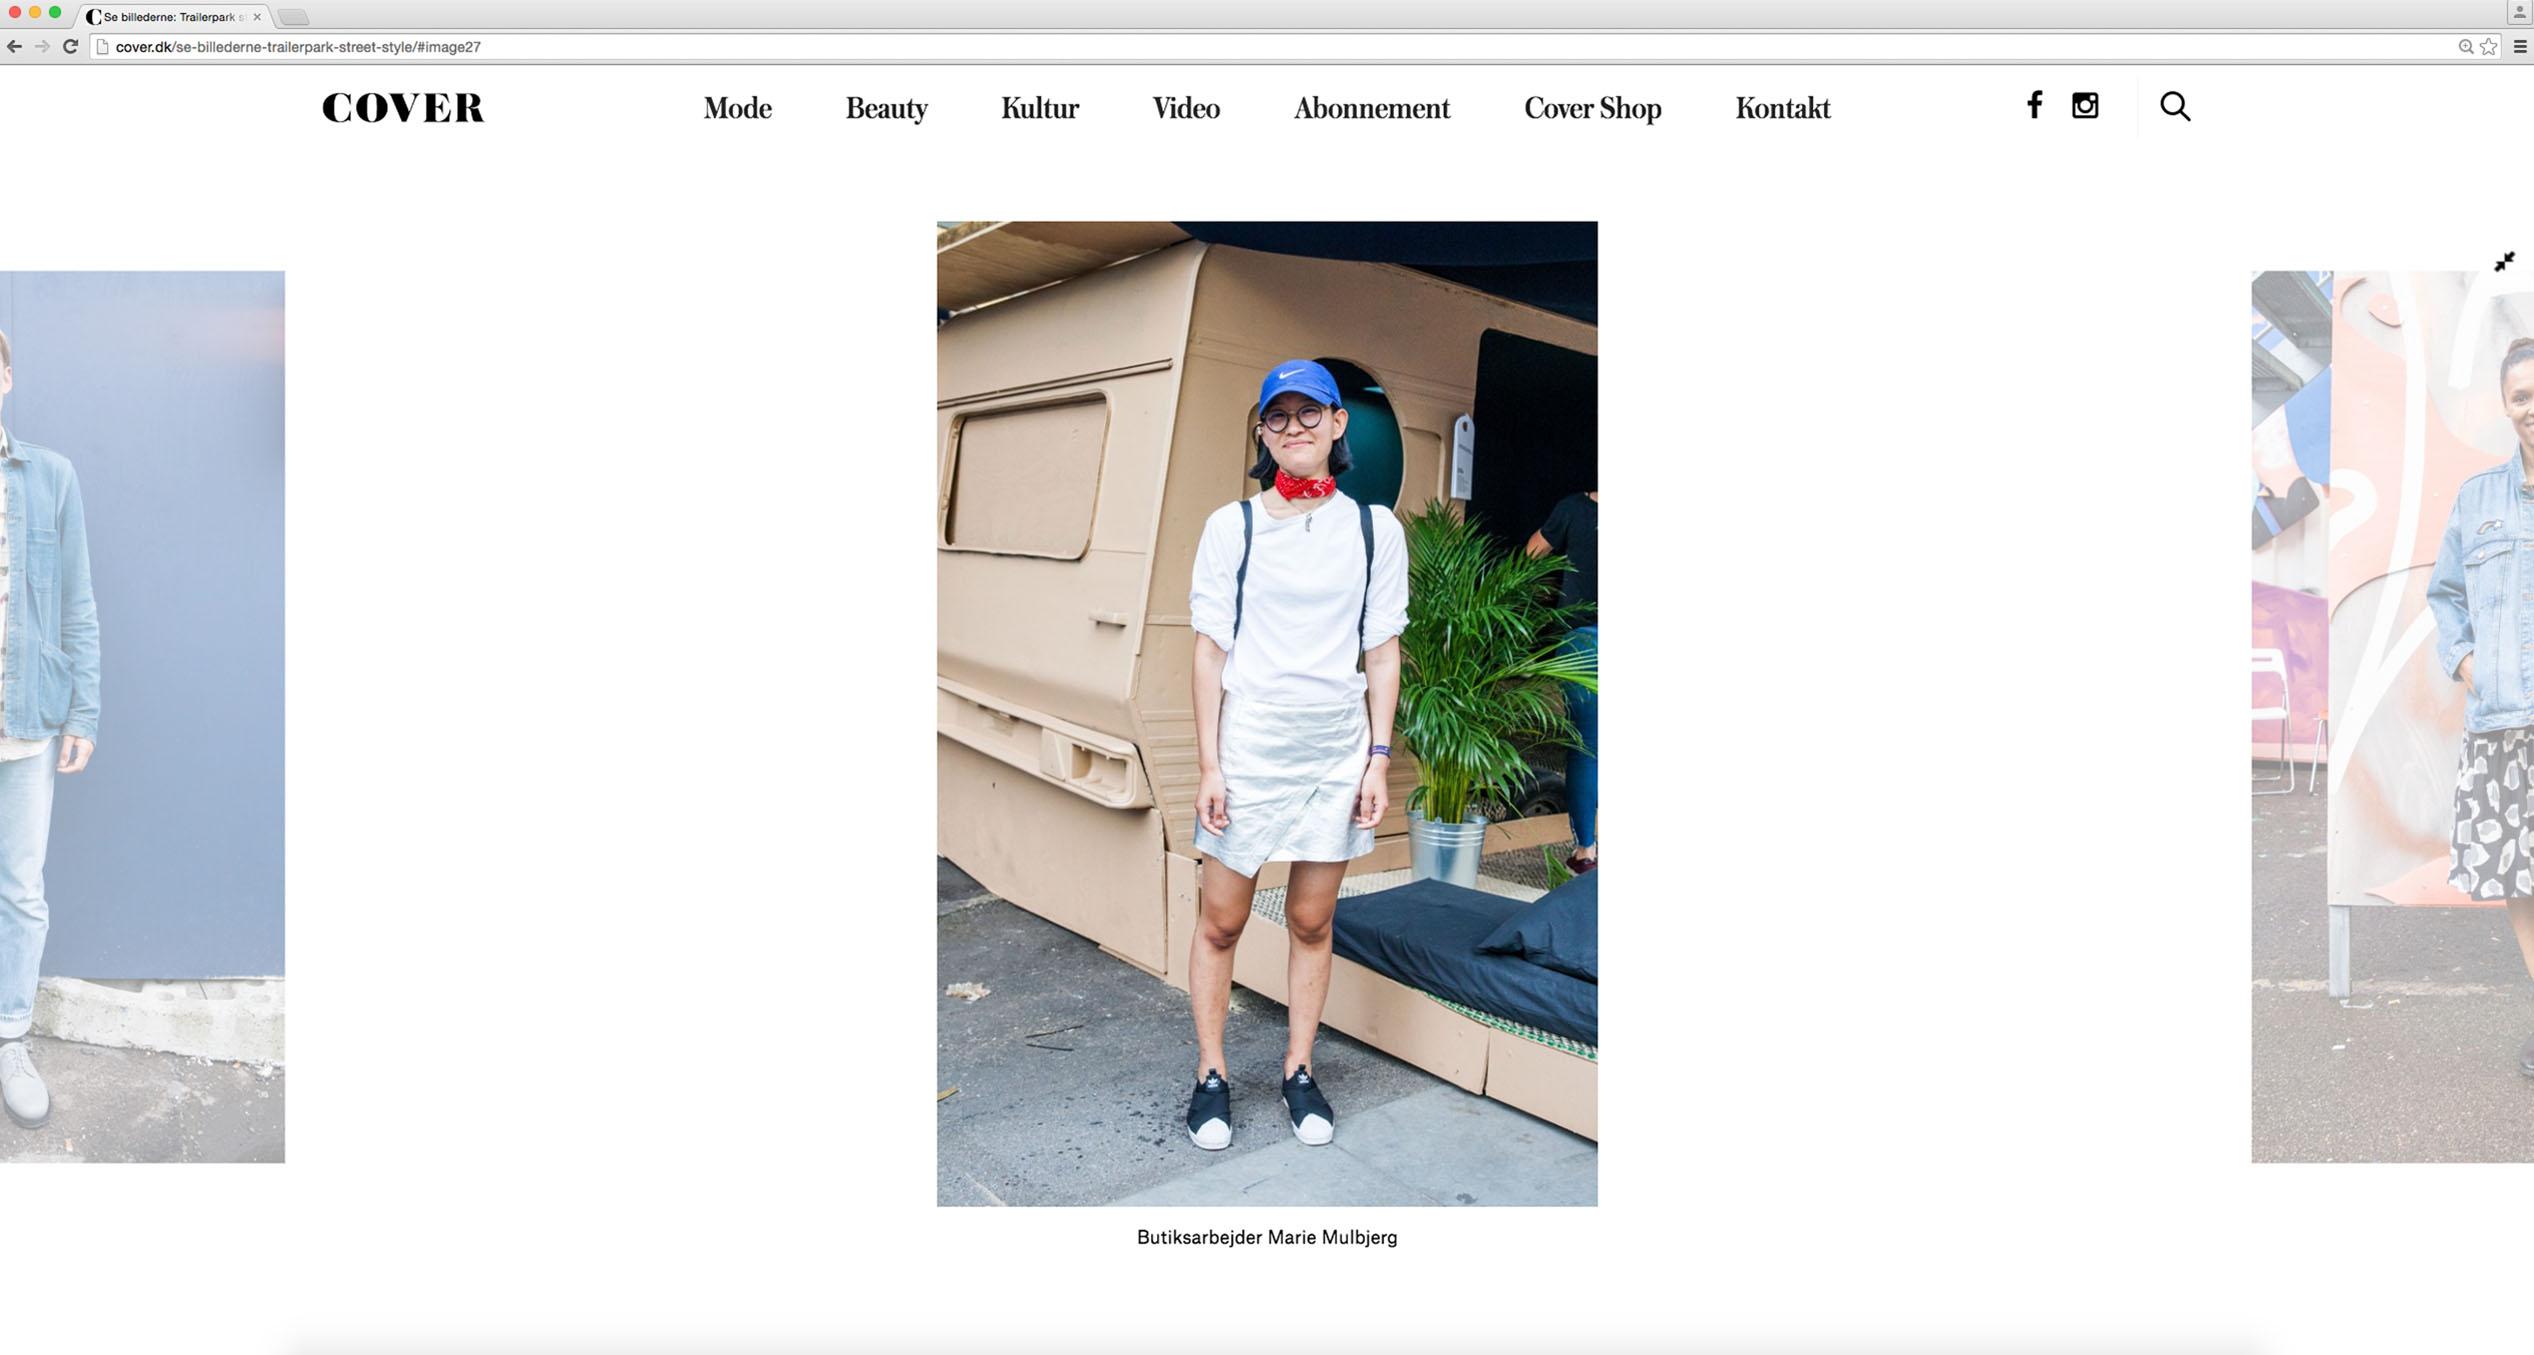 Streetstyle_CoverMagazine_TrailerparkFestival2016_27